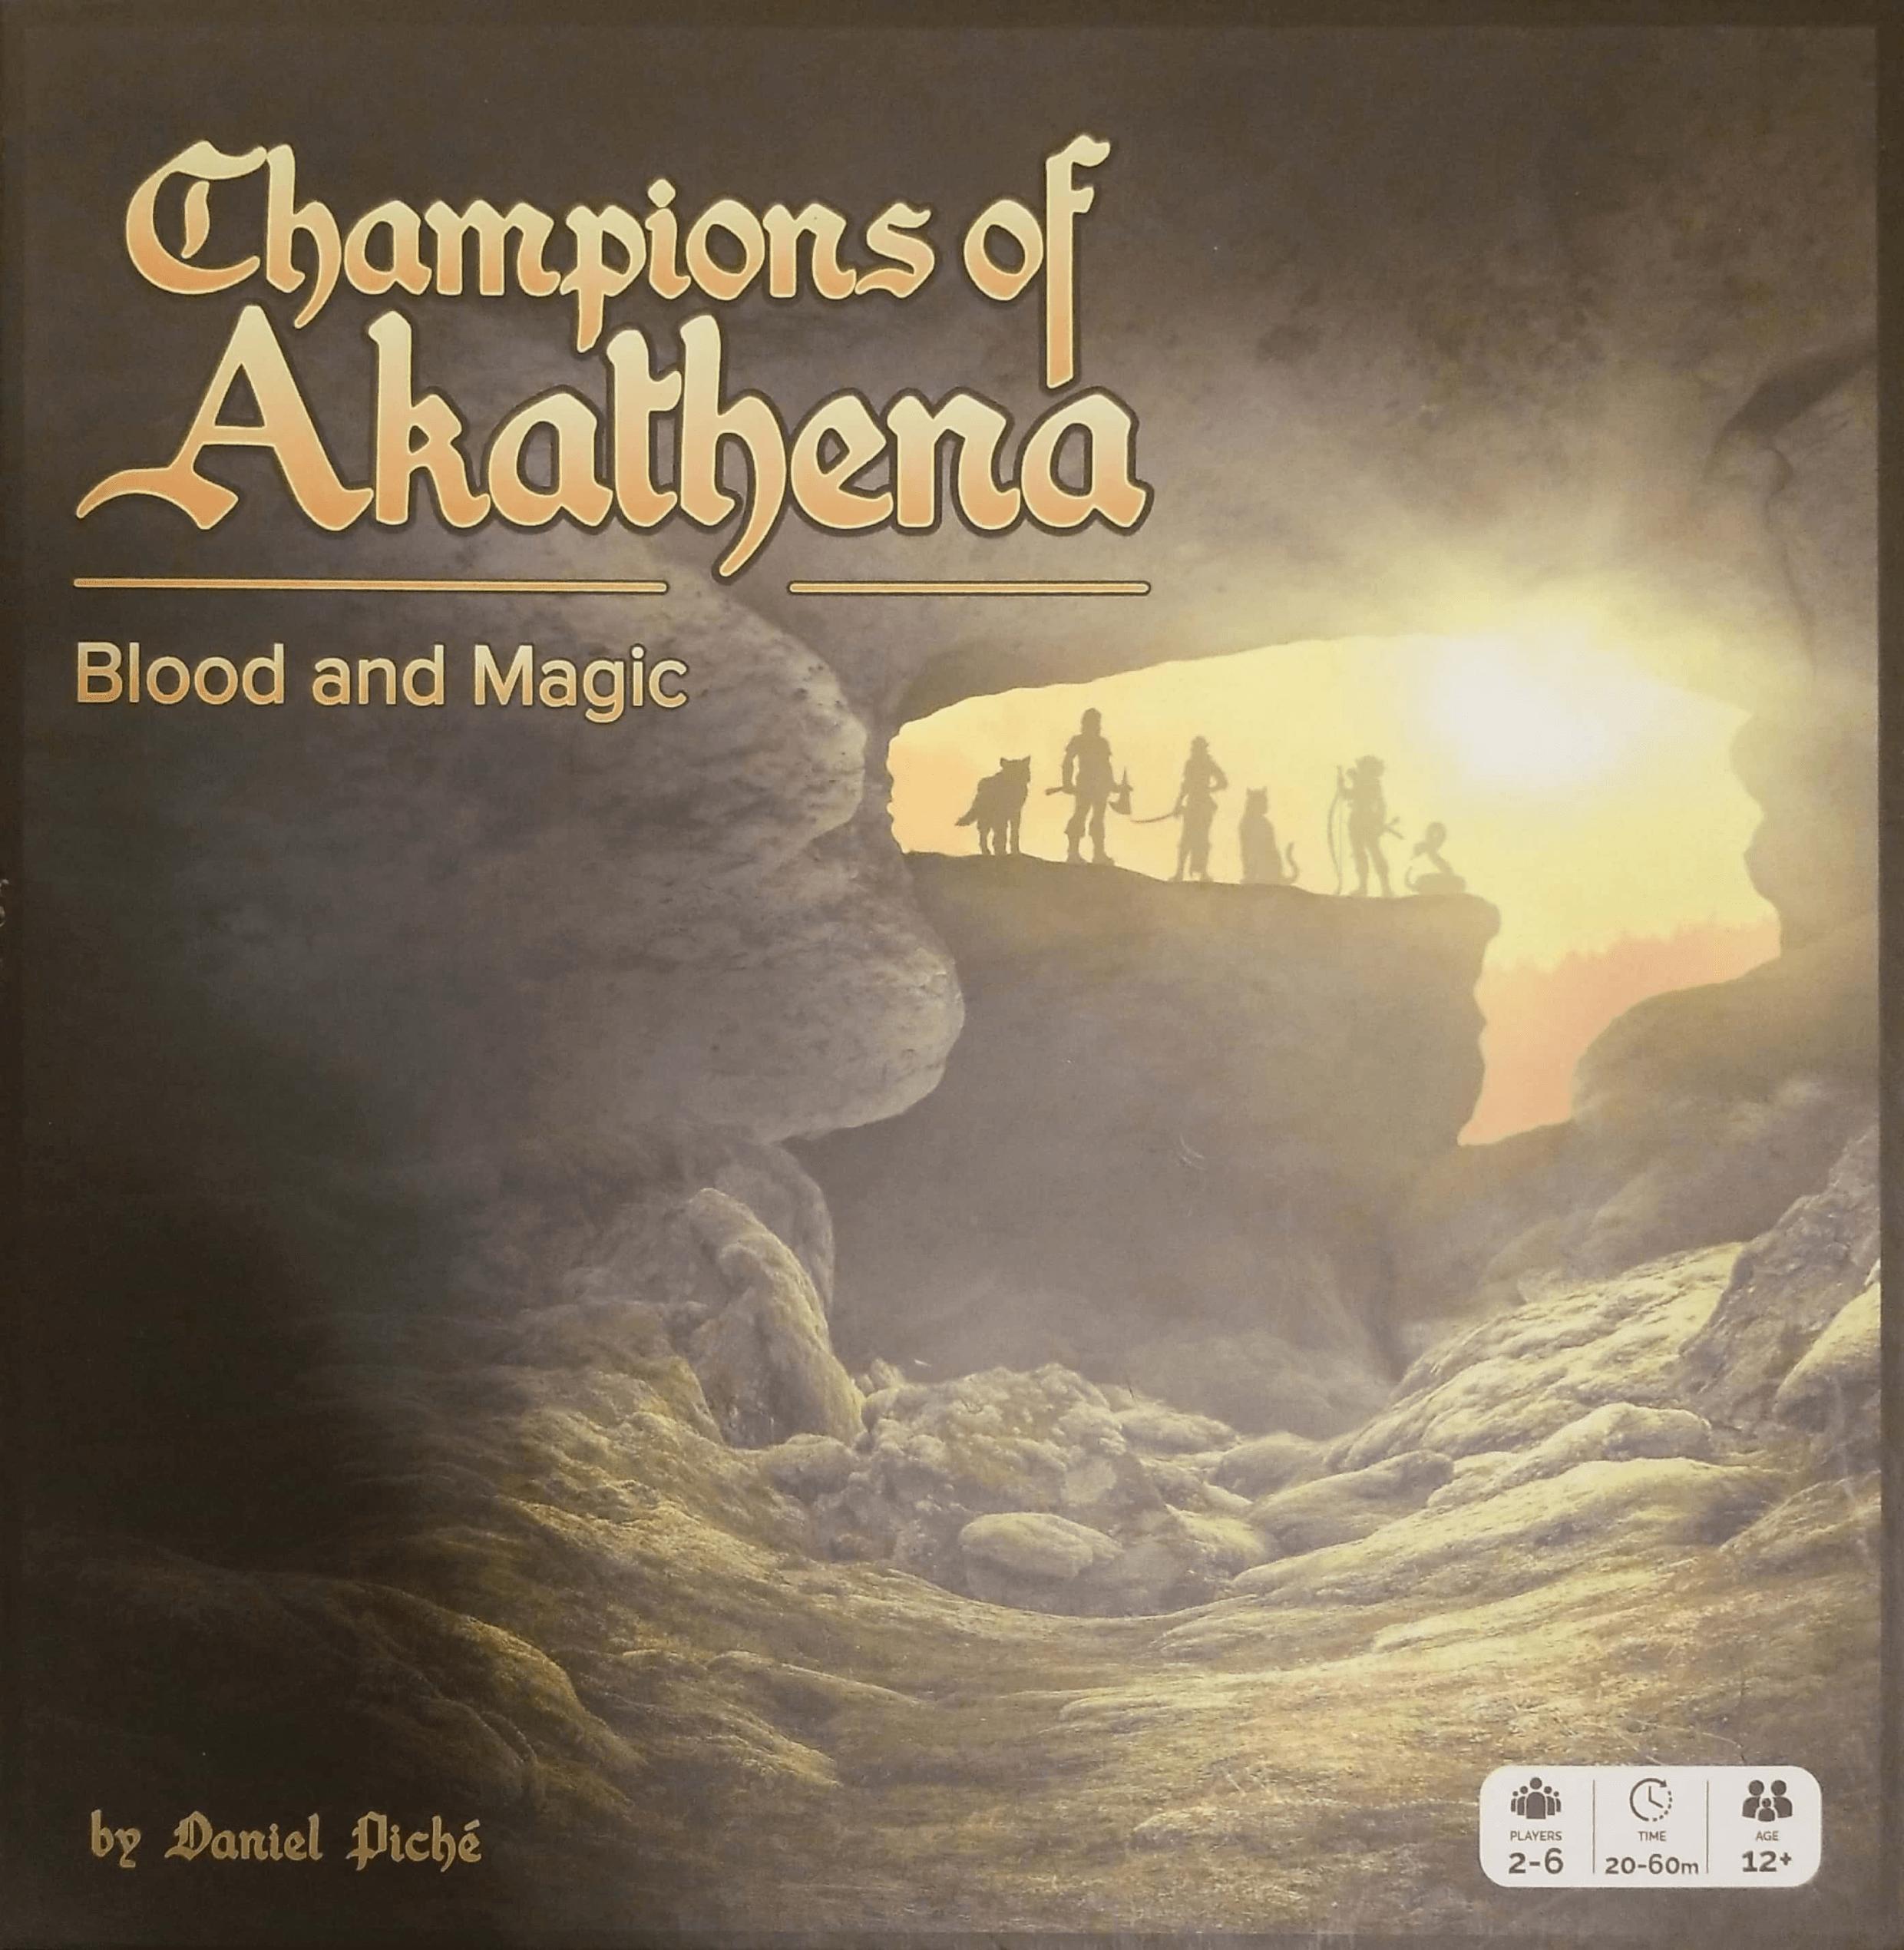 Champions of Akathena: Into the Wild